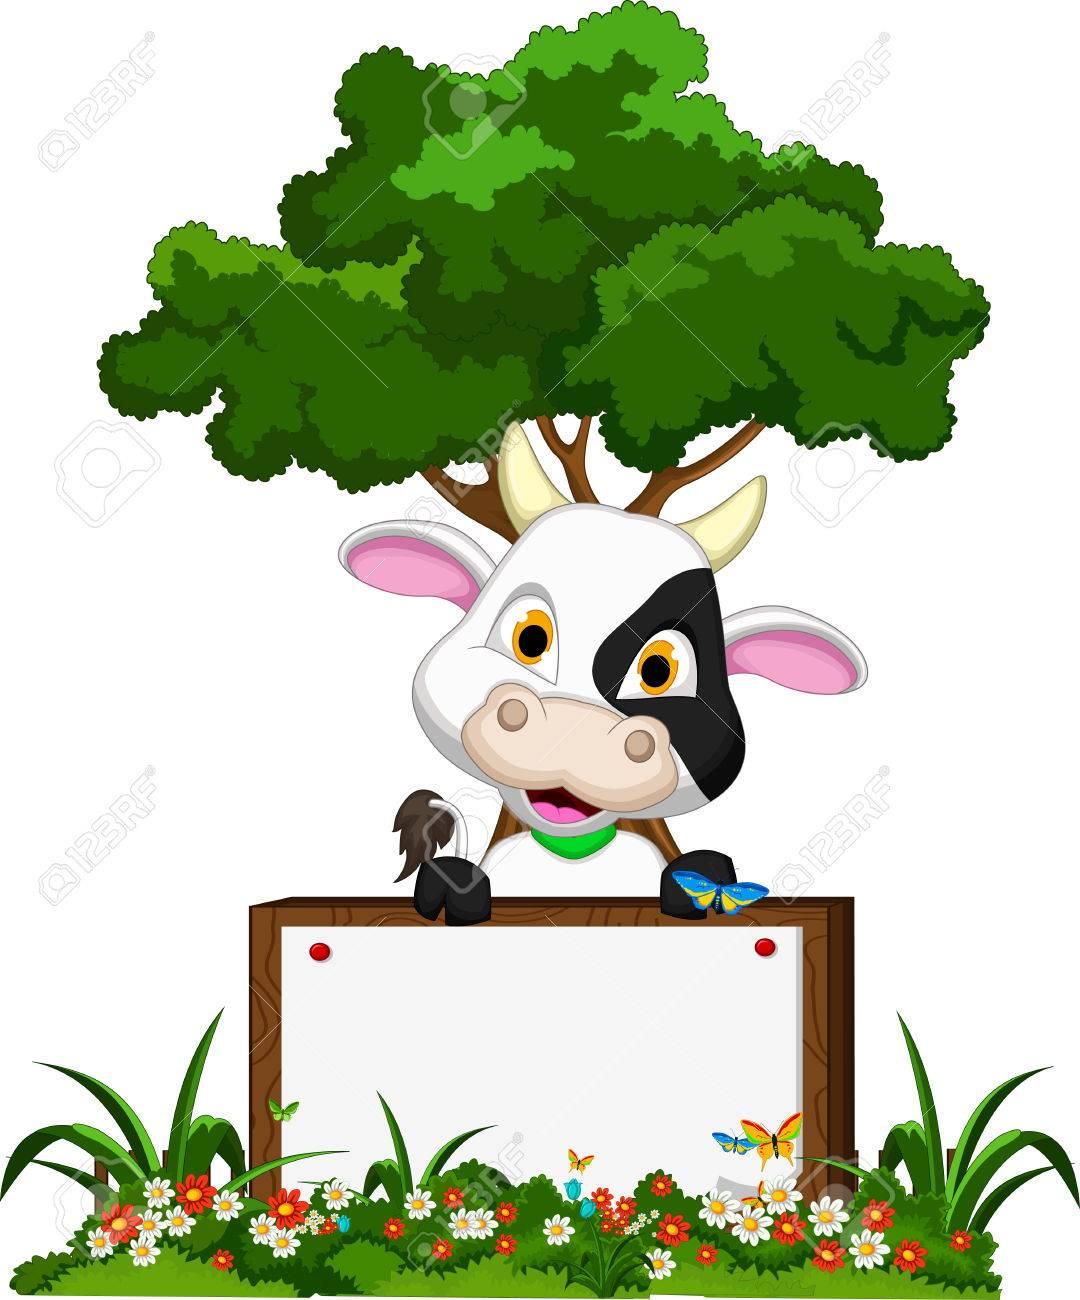 Flower garden cartoon - Cute Cow Cartoon On Flower Garden With Blank Board Stock Vector 28346045